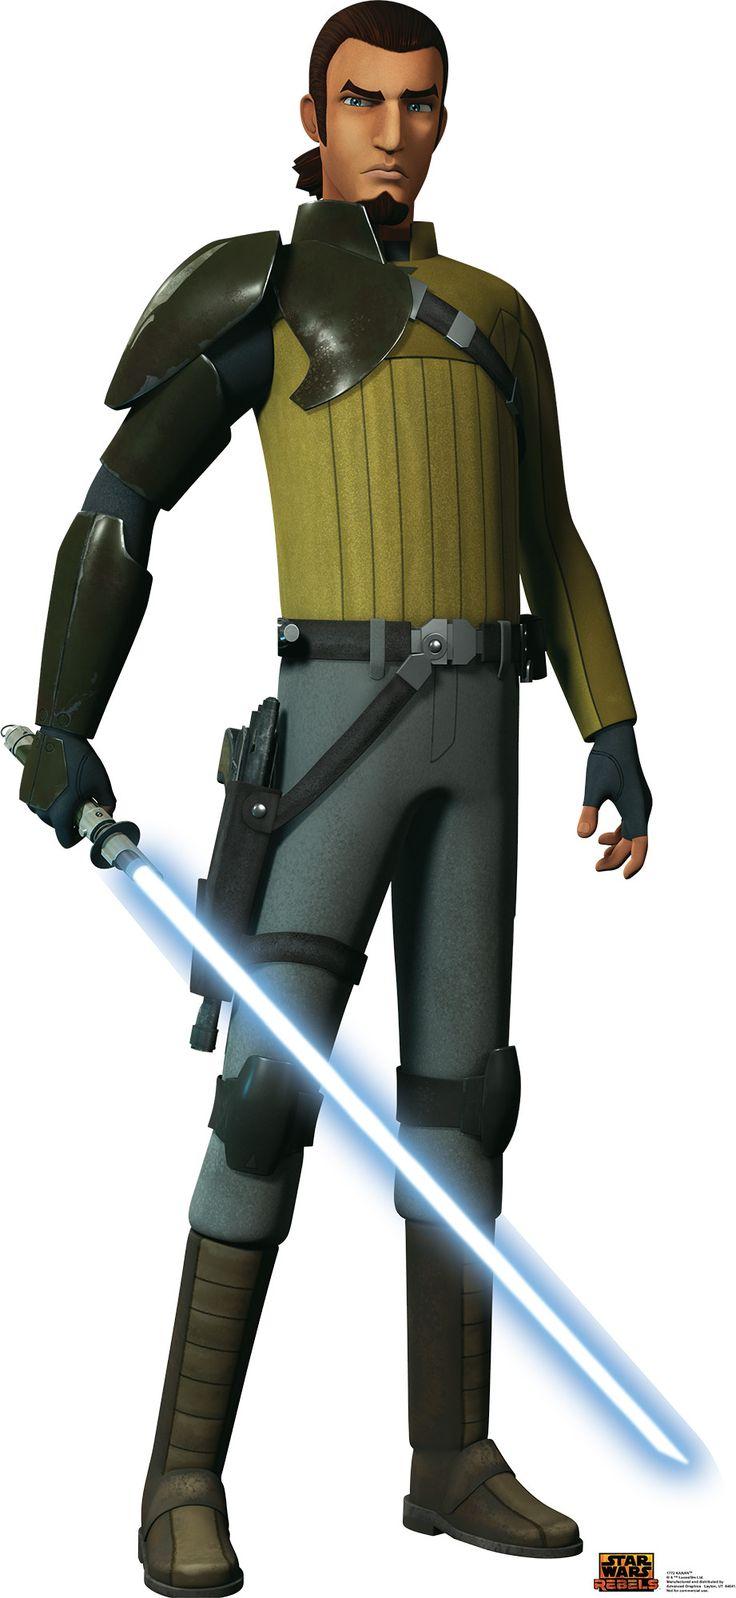 Star Wars Rebels Kanan Jarrus Cardboard Standup